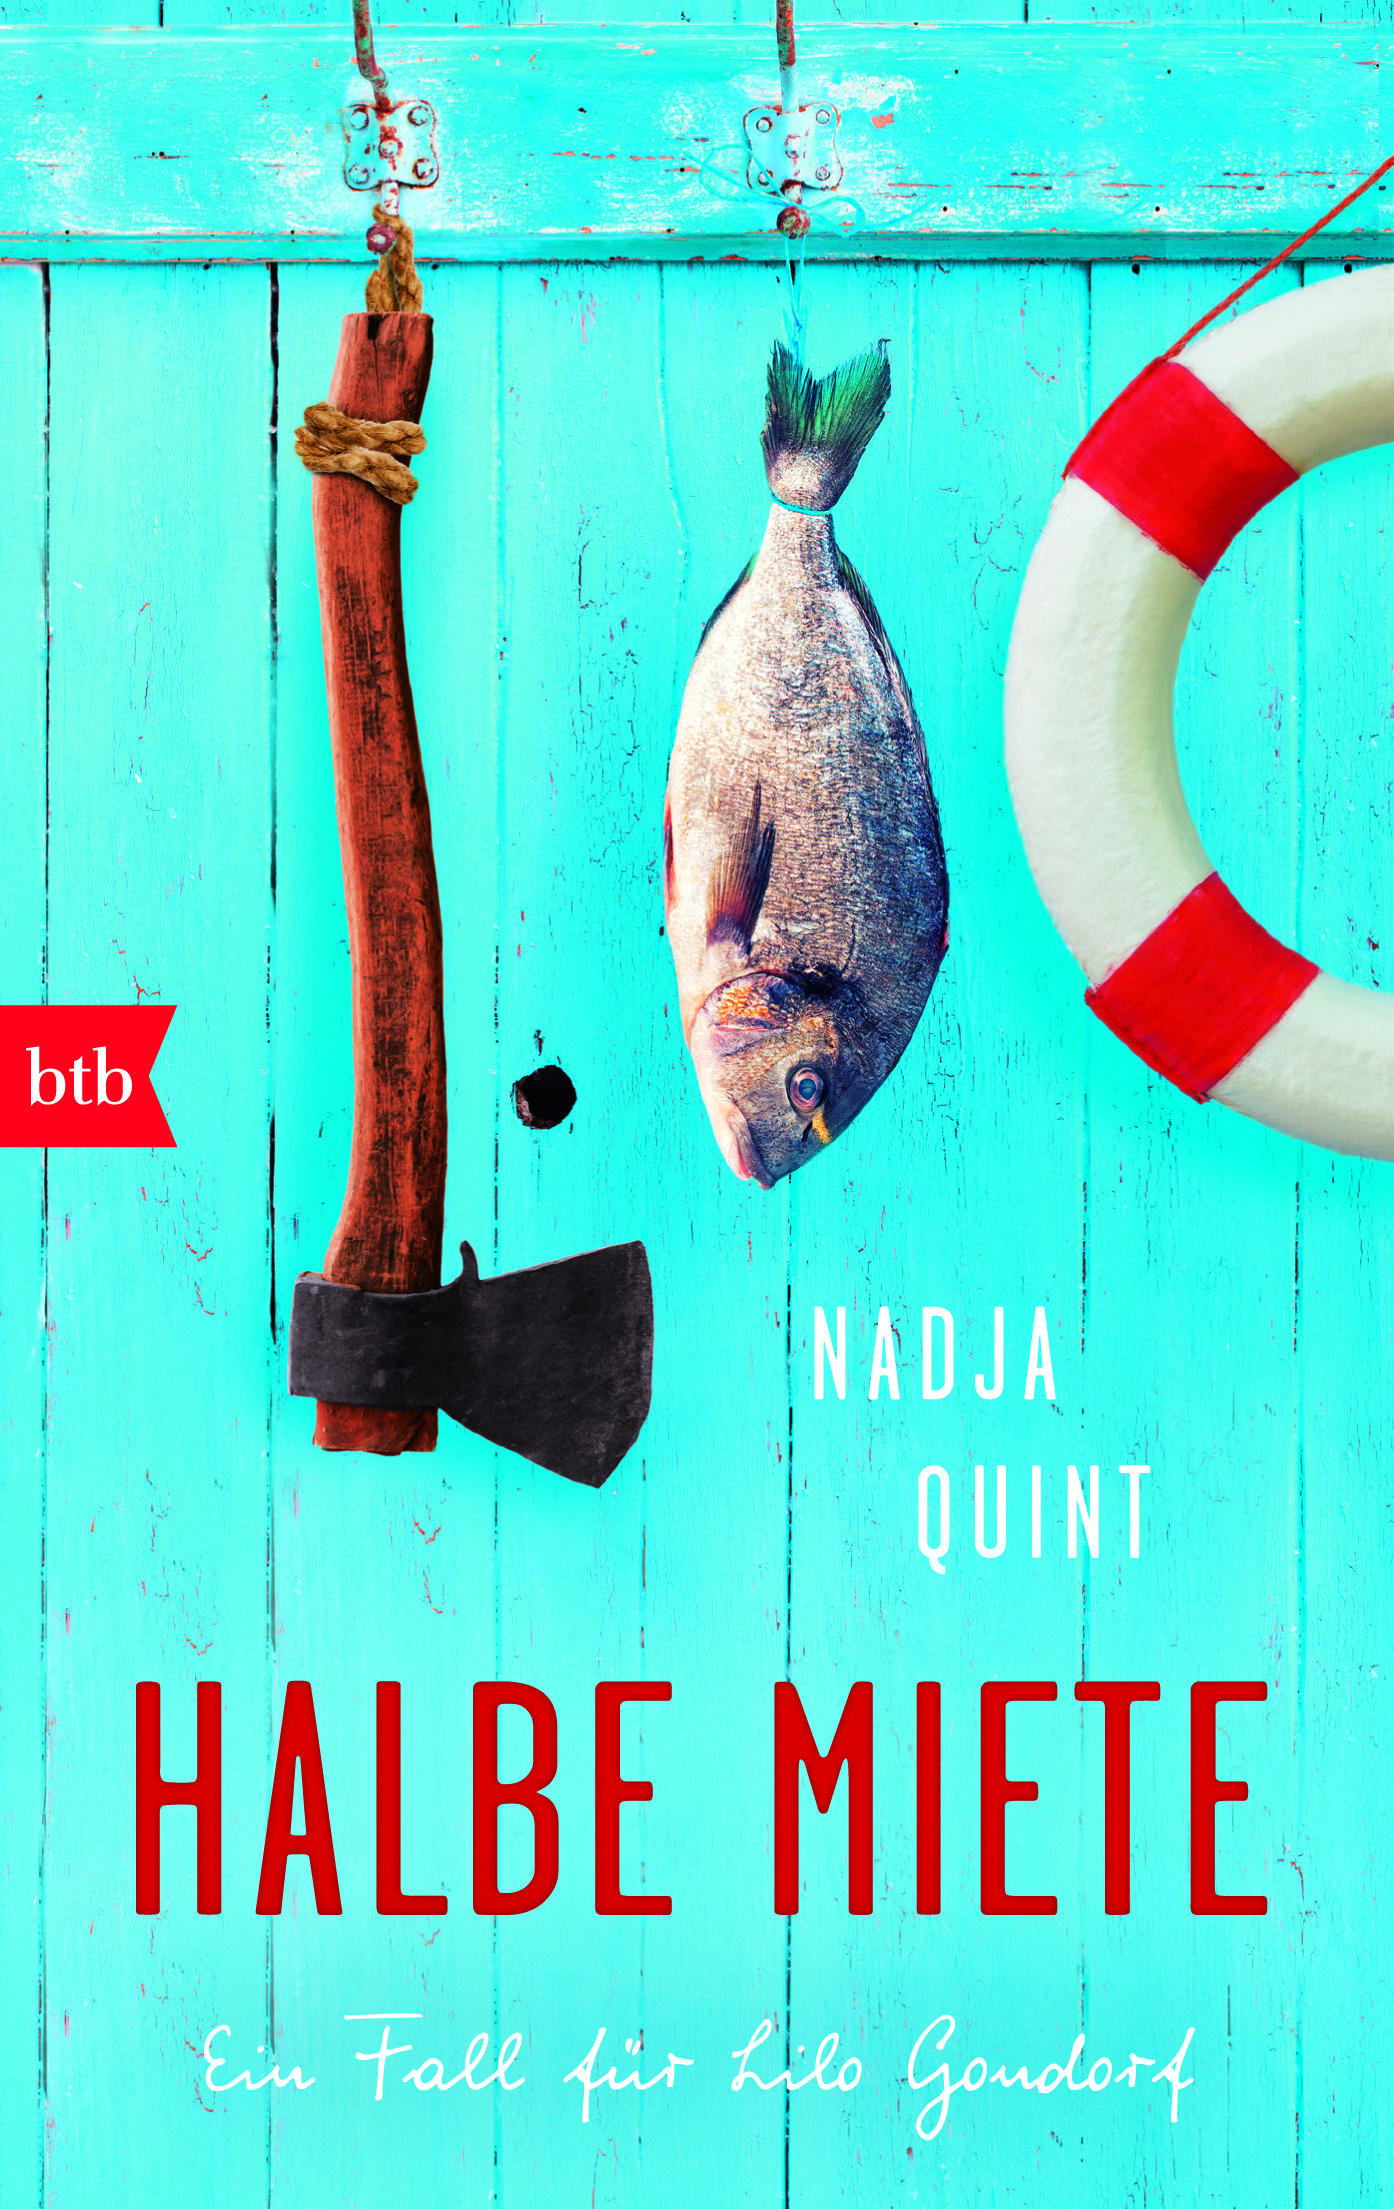 Nadja Quint: Halbe Miete (@randomhouse )